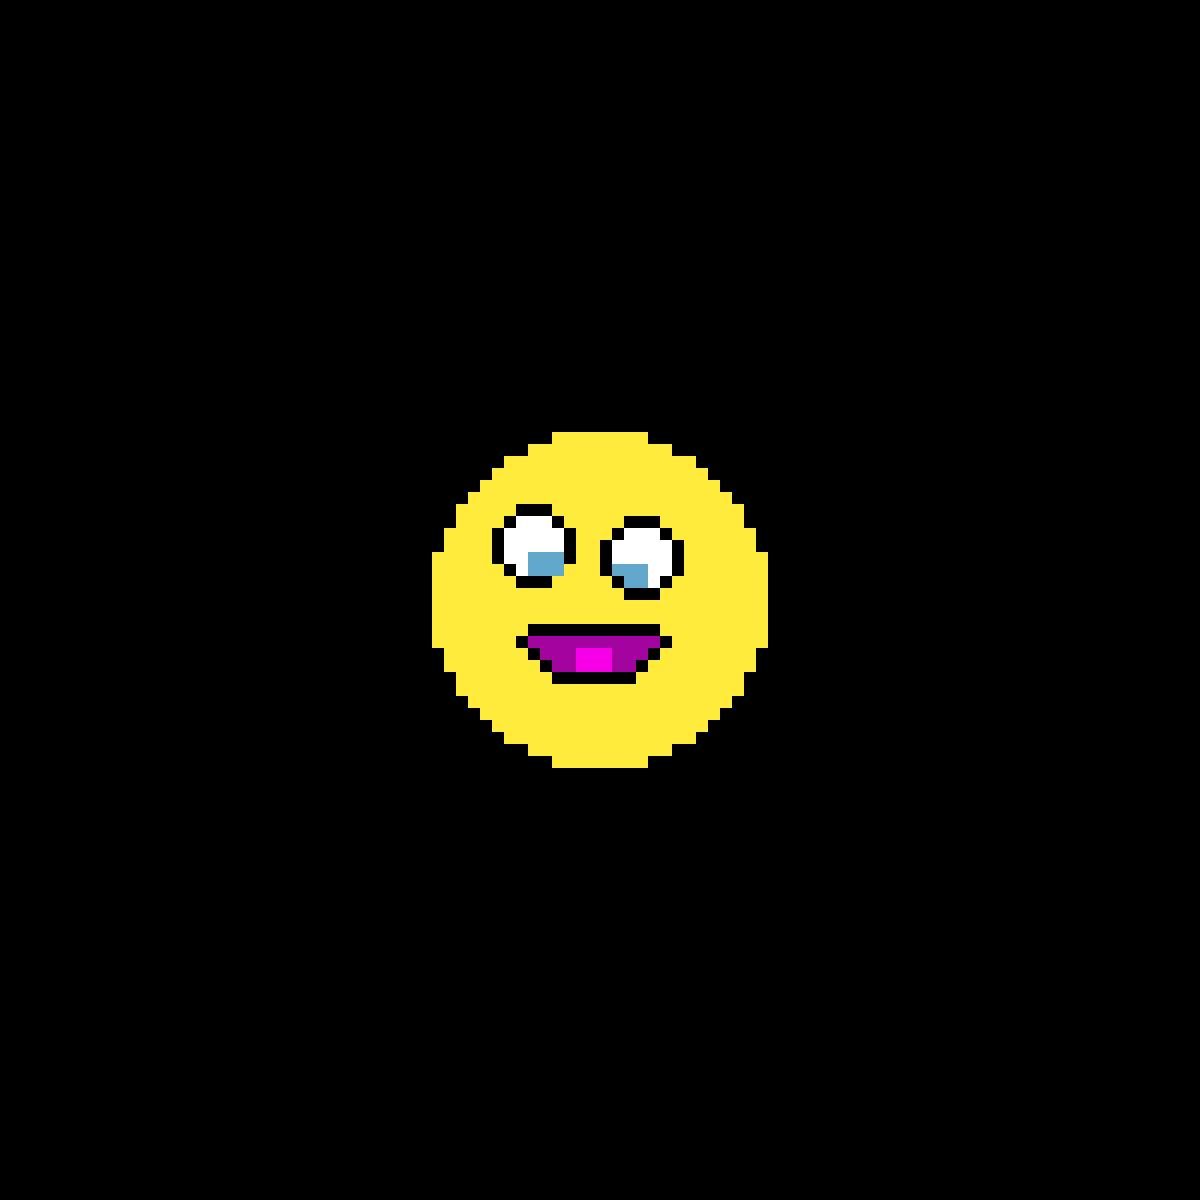 n0ob head by Dmangames7